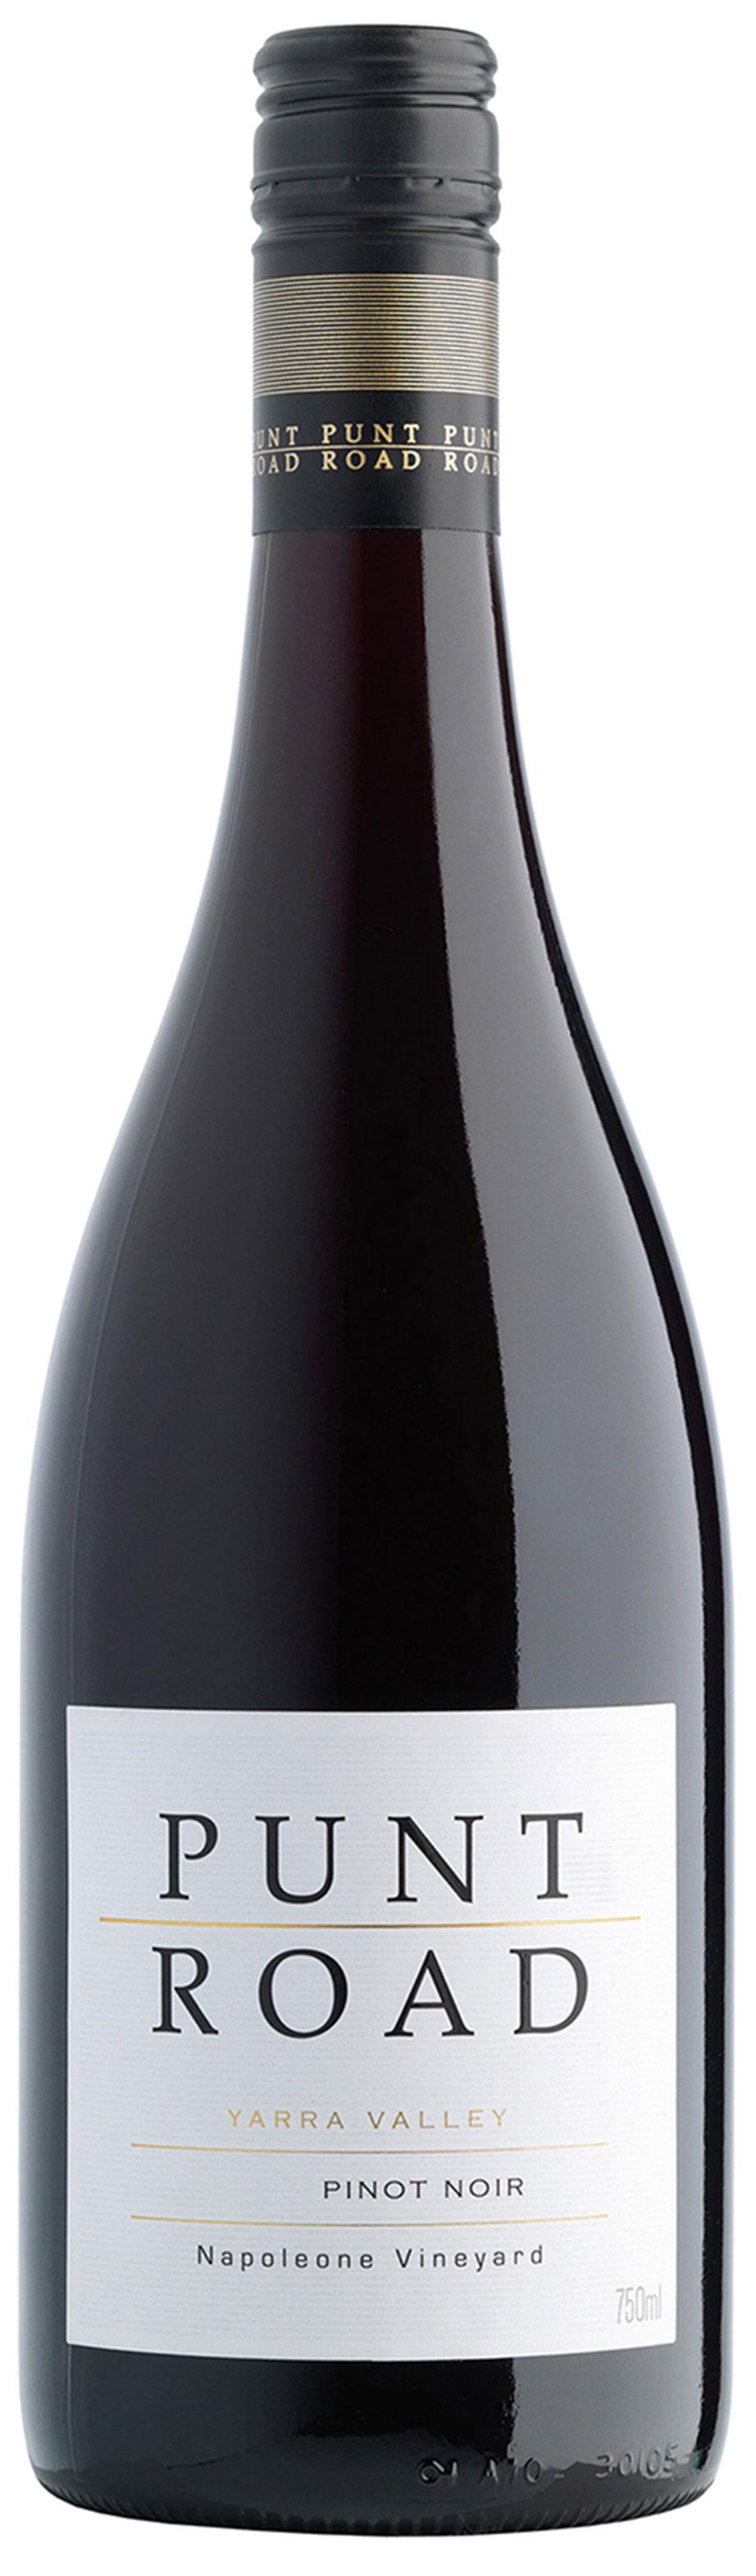 https://vinocorpperu.com/images/vinos/puntroad/punt_road_pinot_noir_2017.jpg